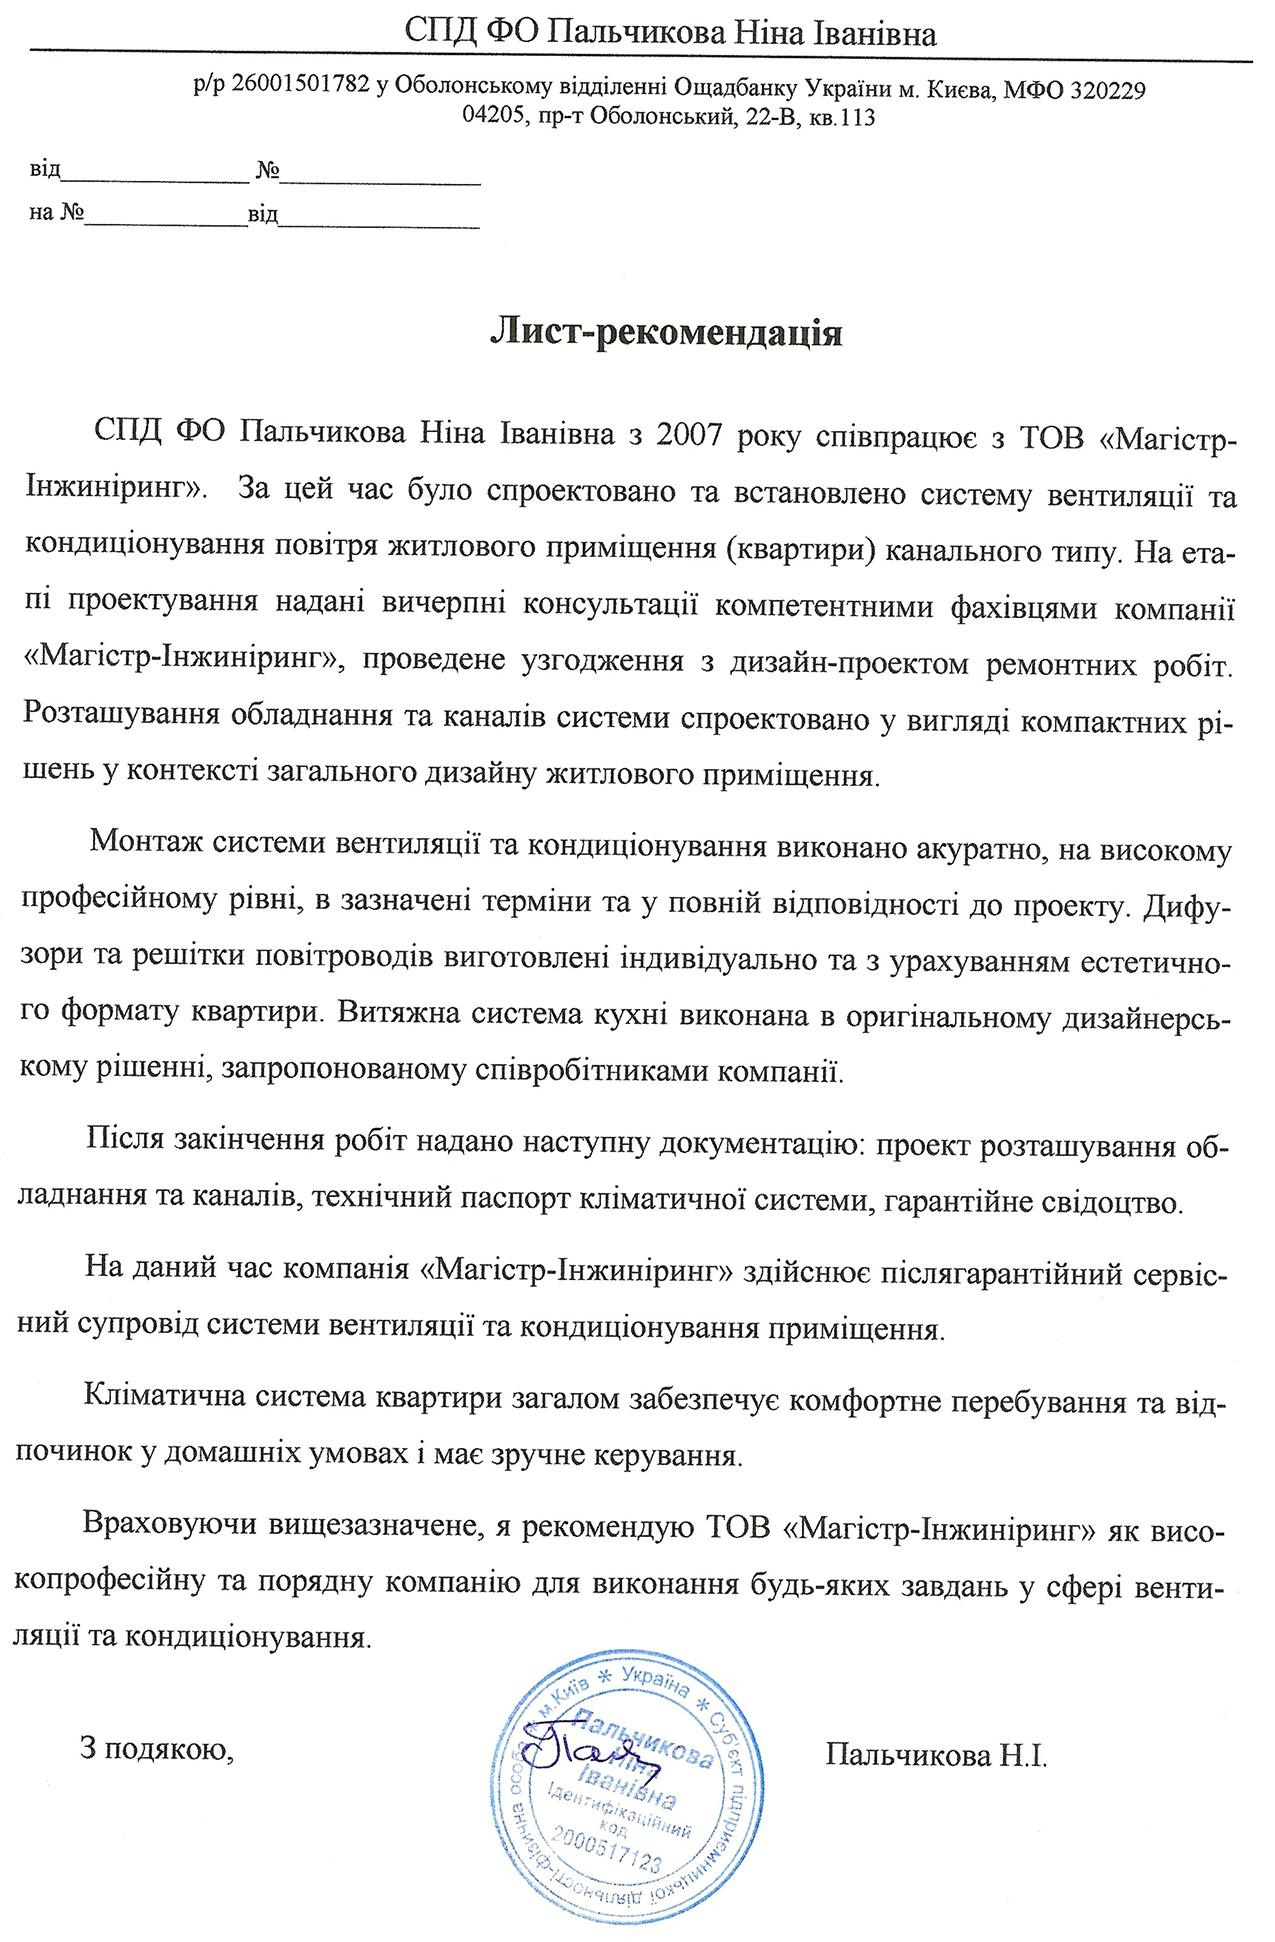 Palchikova-NI